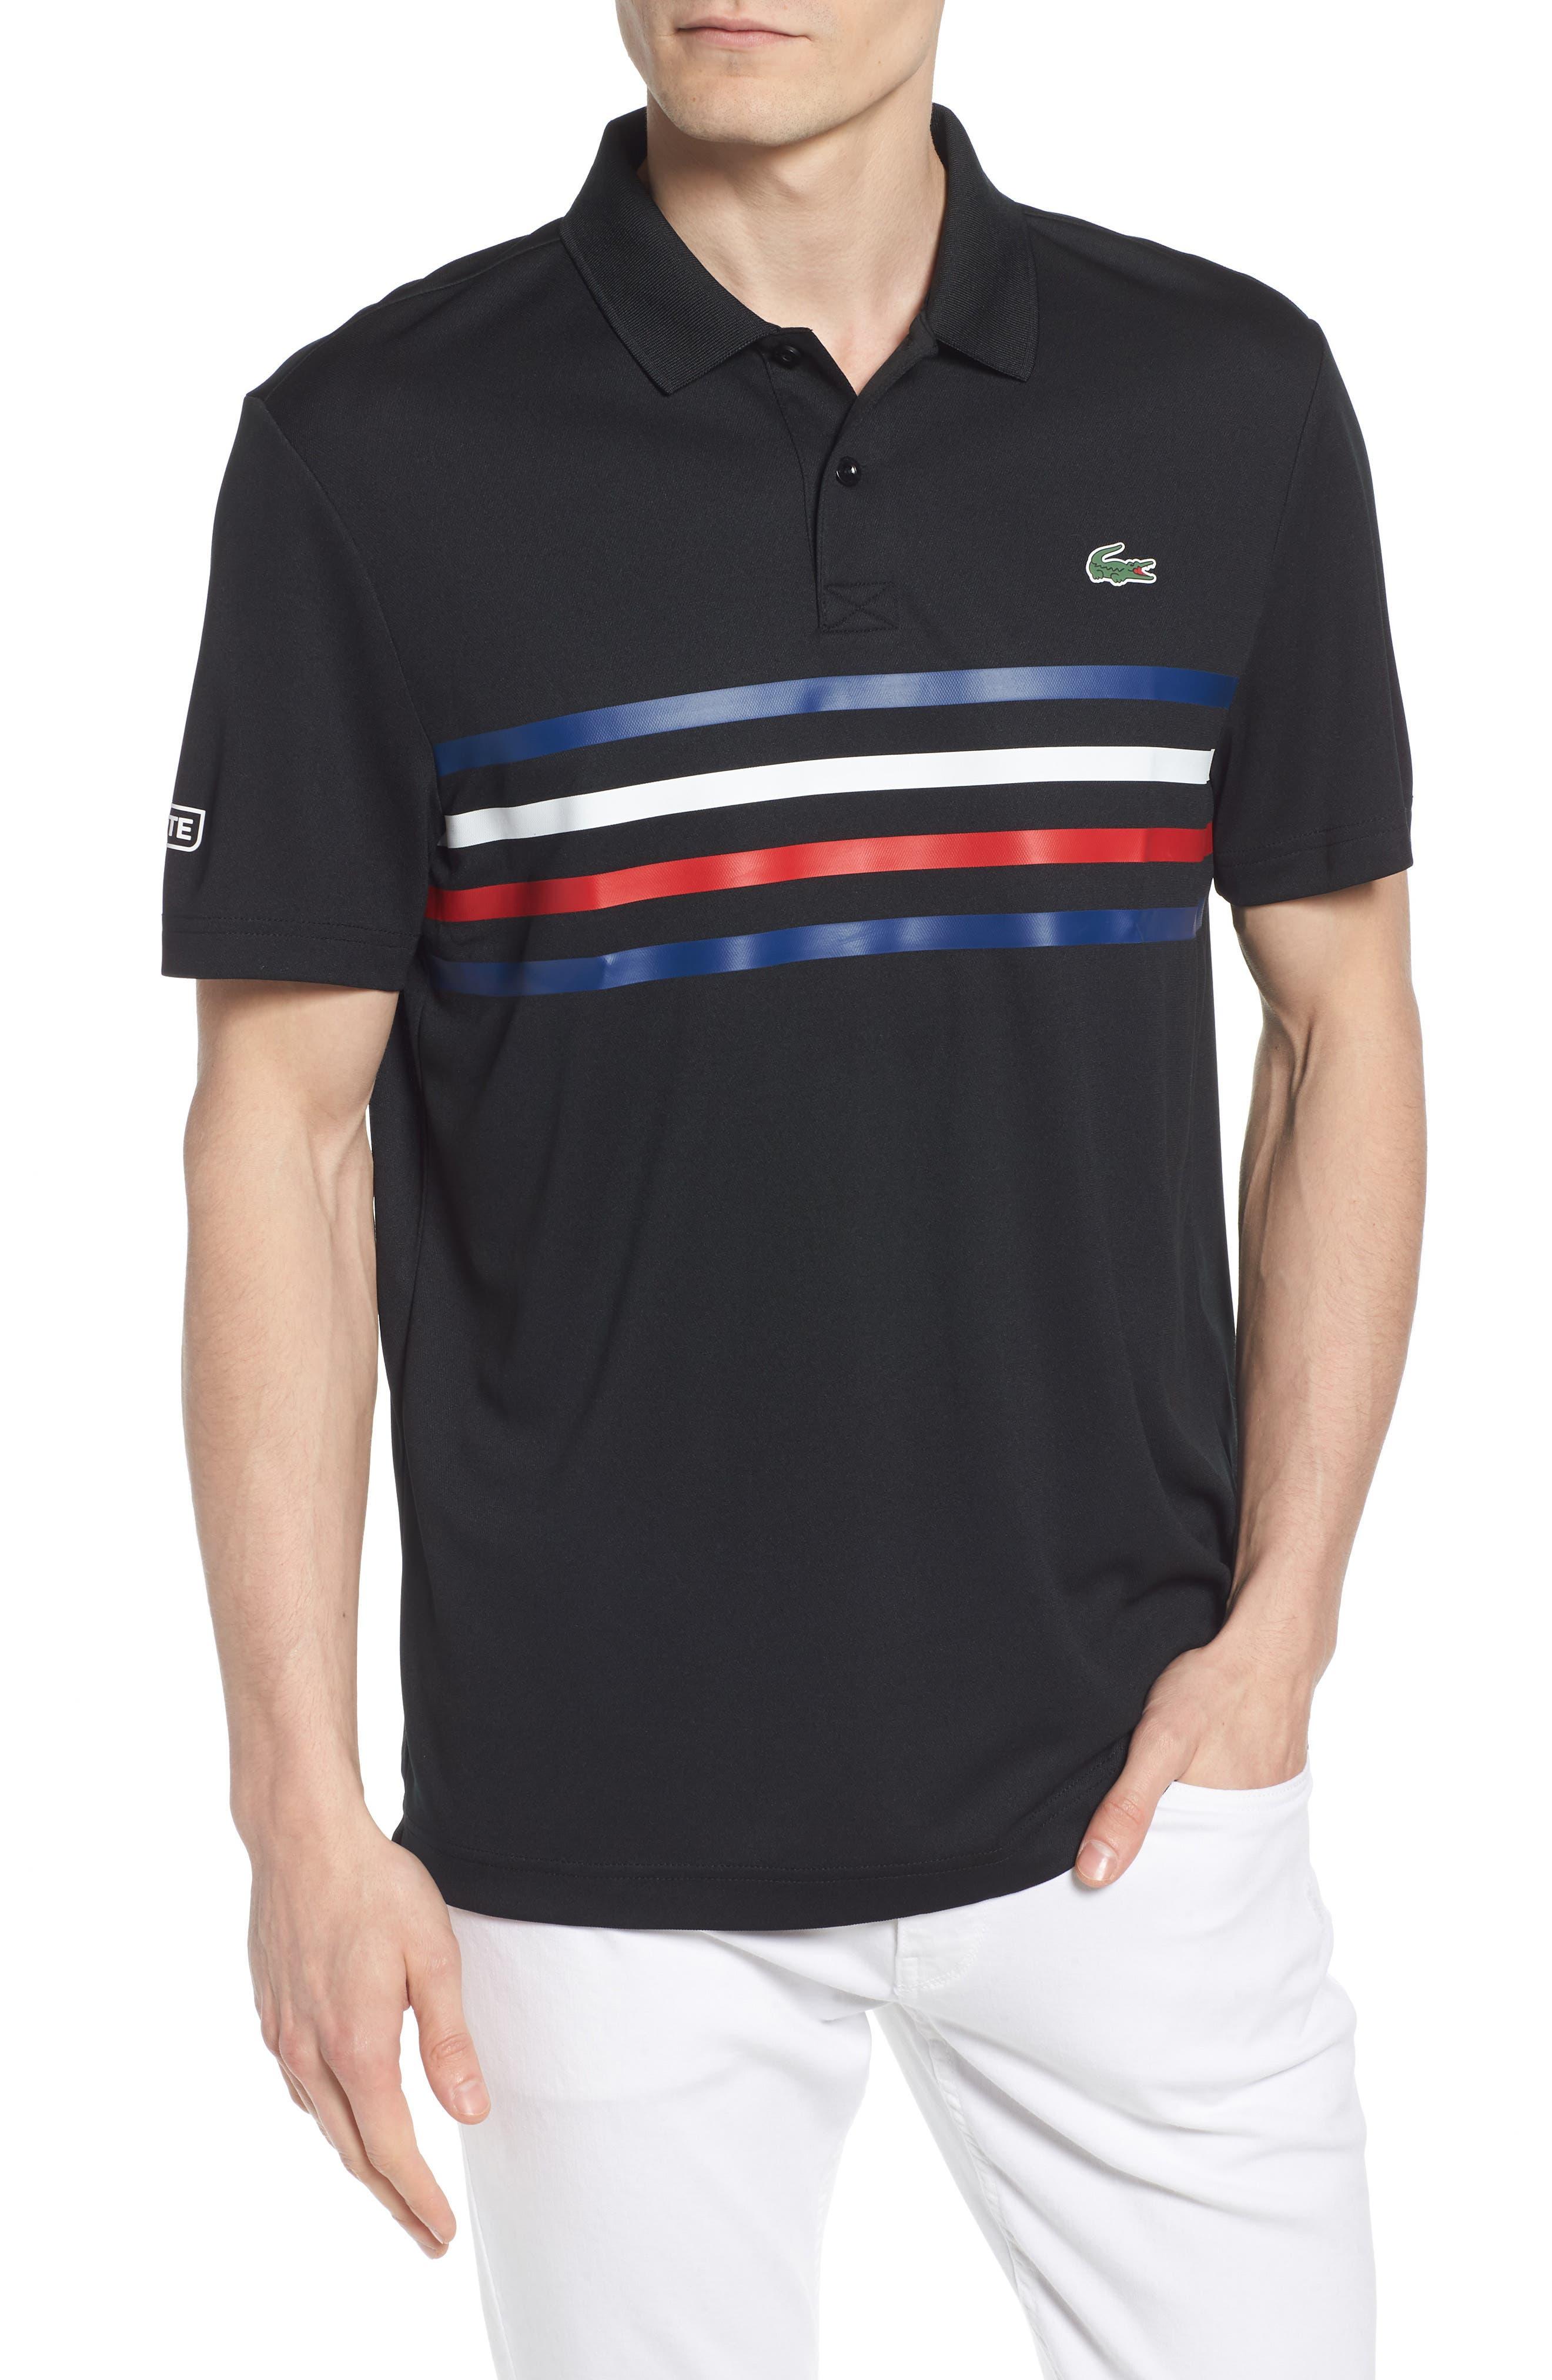 Lacoste Sport Colored Bands Technical Piqué Tennis Polo